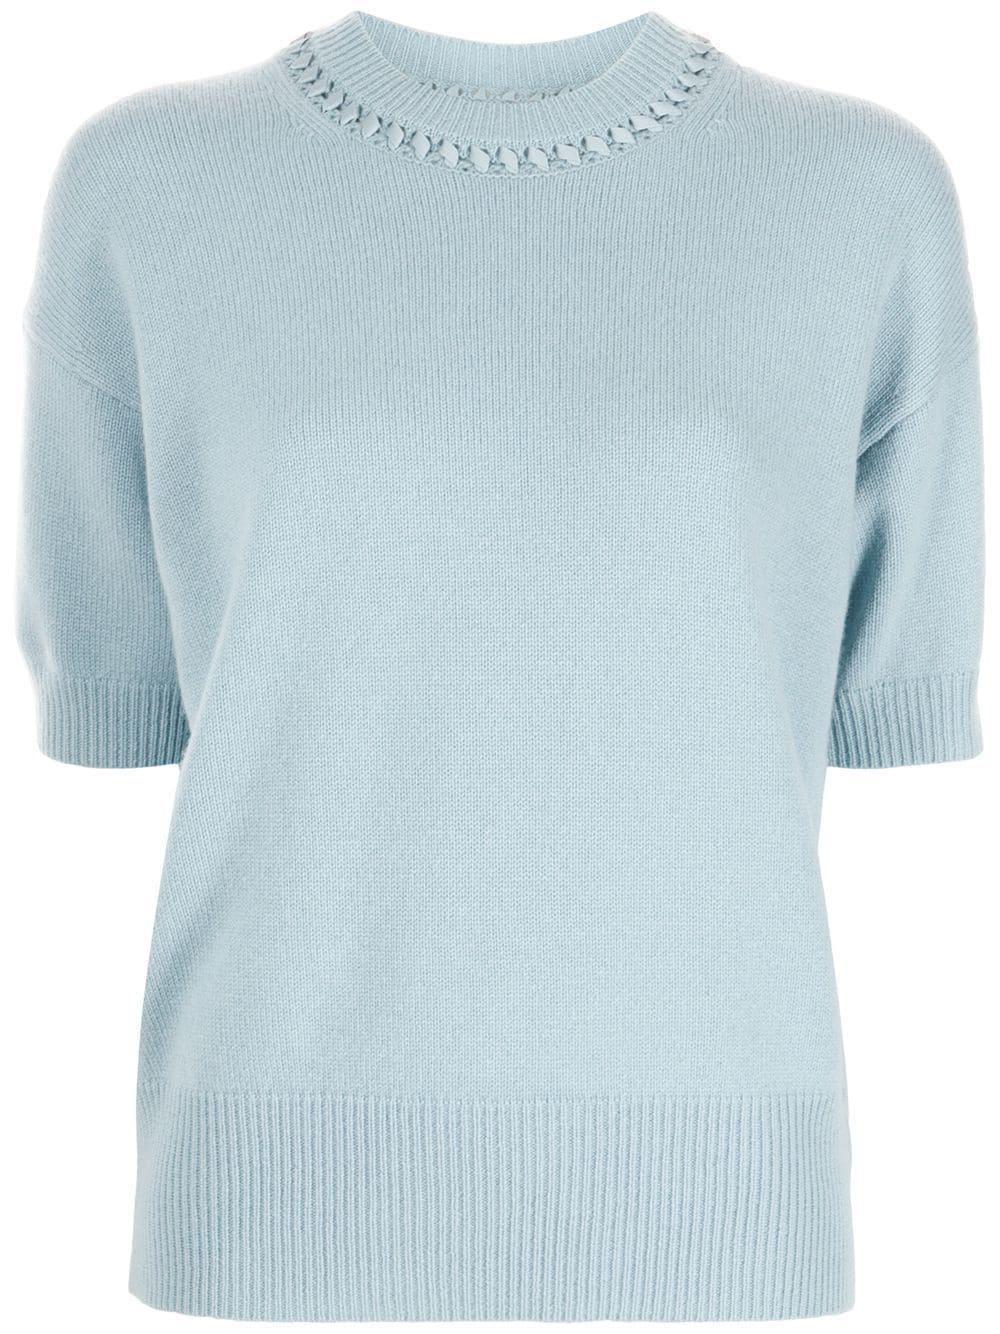 Ribbon Trim Cashmere Sweater Item # L0118706